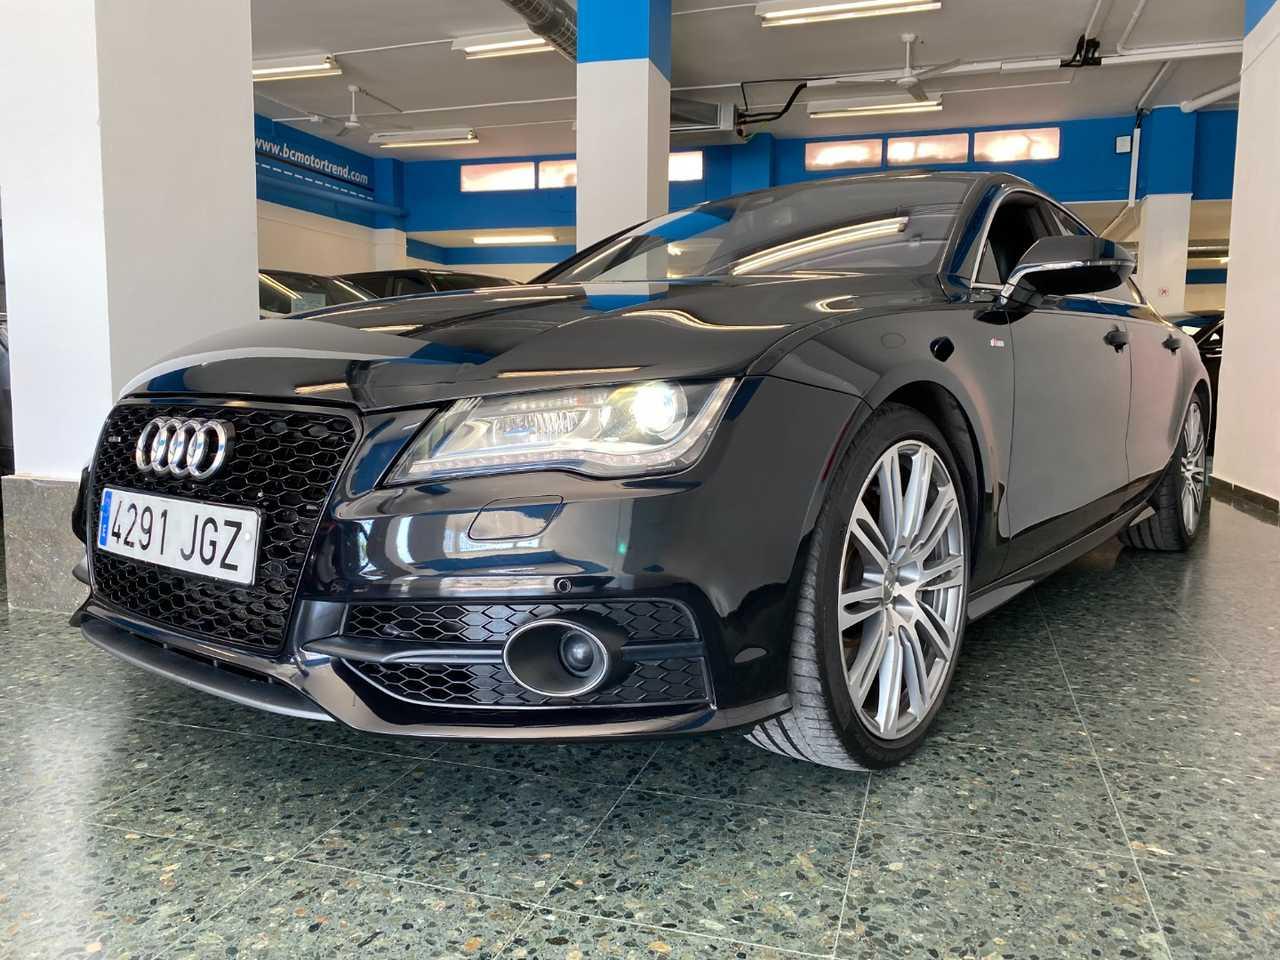 Audi A7 Sportback 3.0 TFSI QUATTRO S-TRONIC S-LINE 300CV   - Foto 1